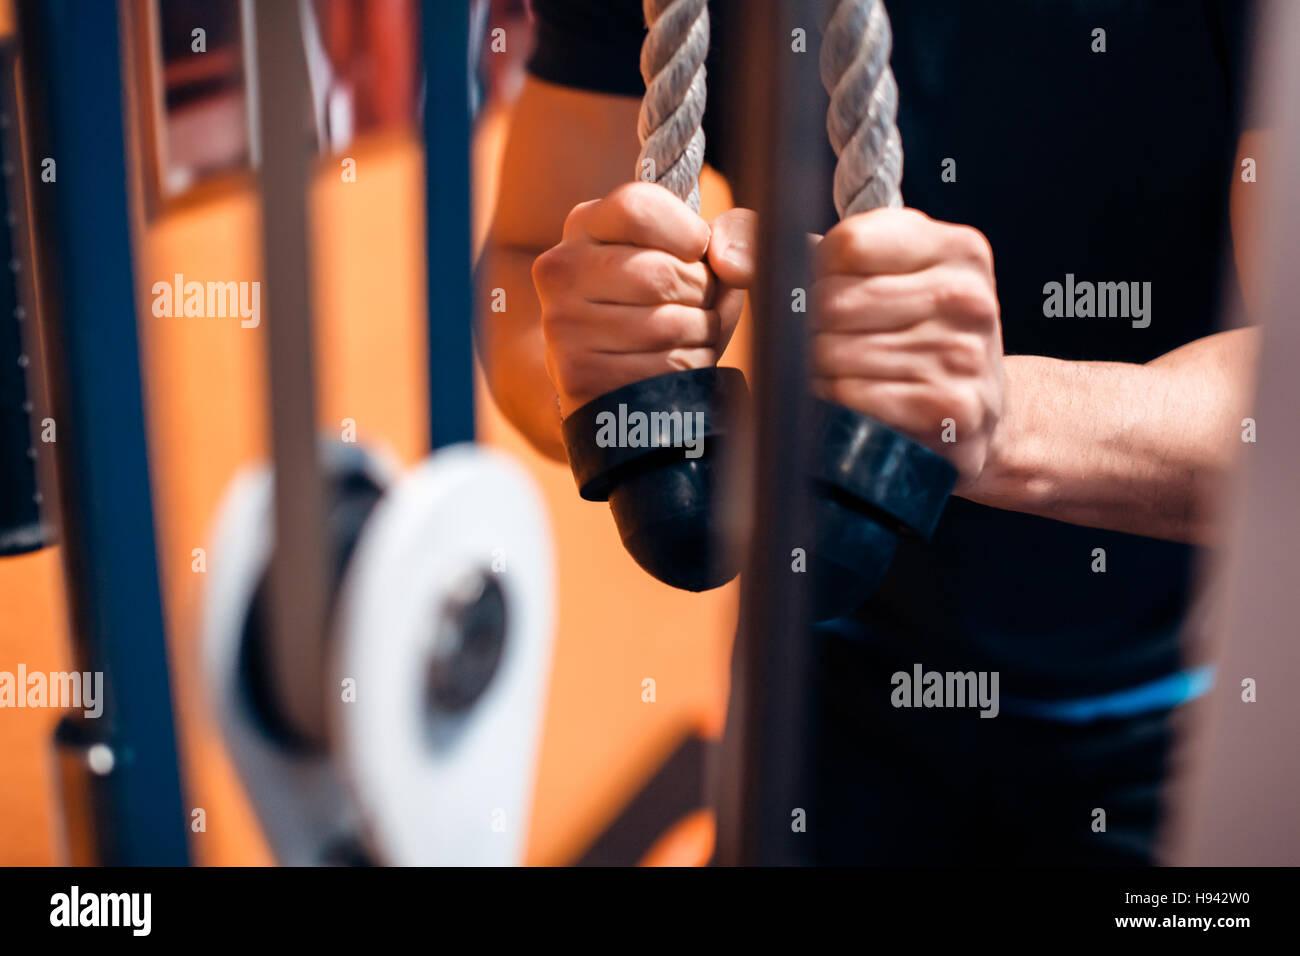 Exercice triceps avec câbles Photo Stock